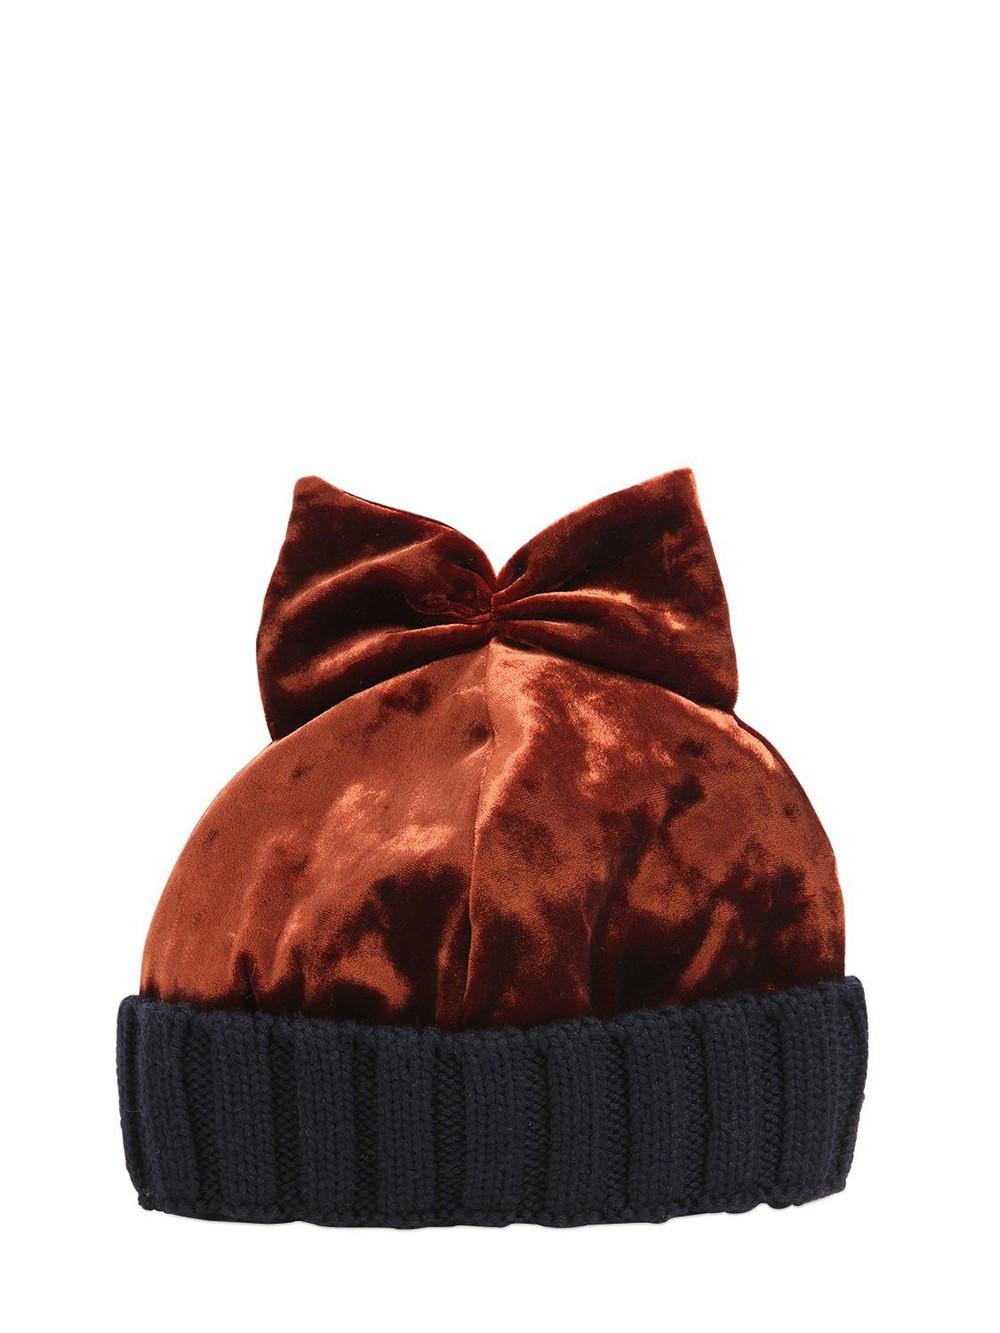 FEDERICA MORETTI Velvet & Wool Knit Beanie Hat W/ Bow in blue